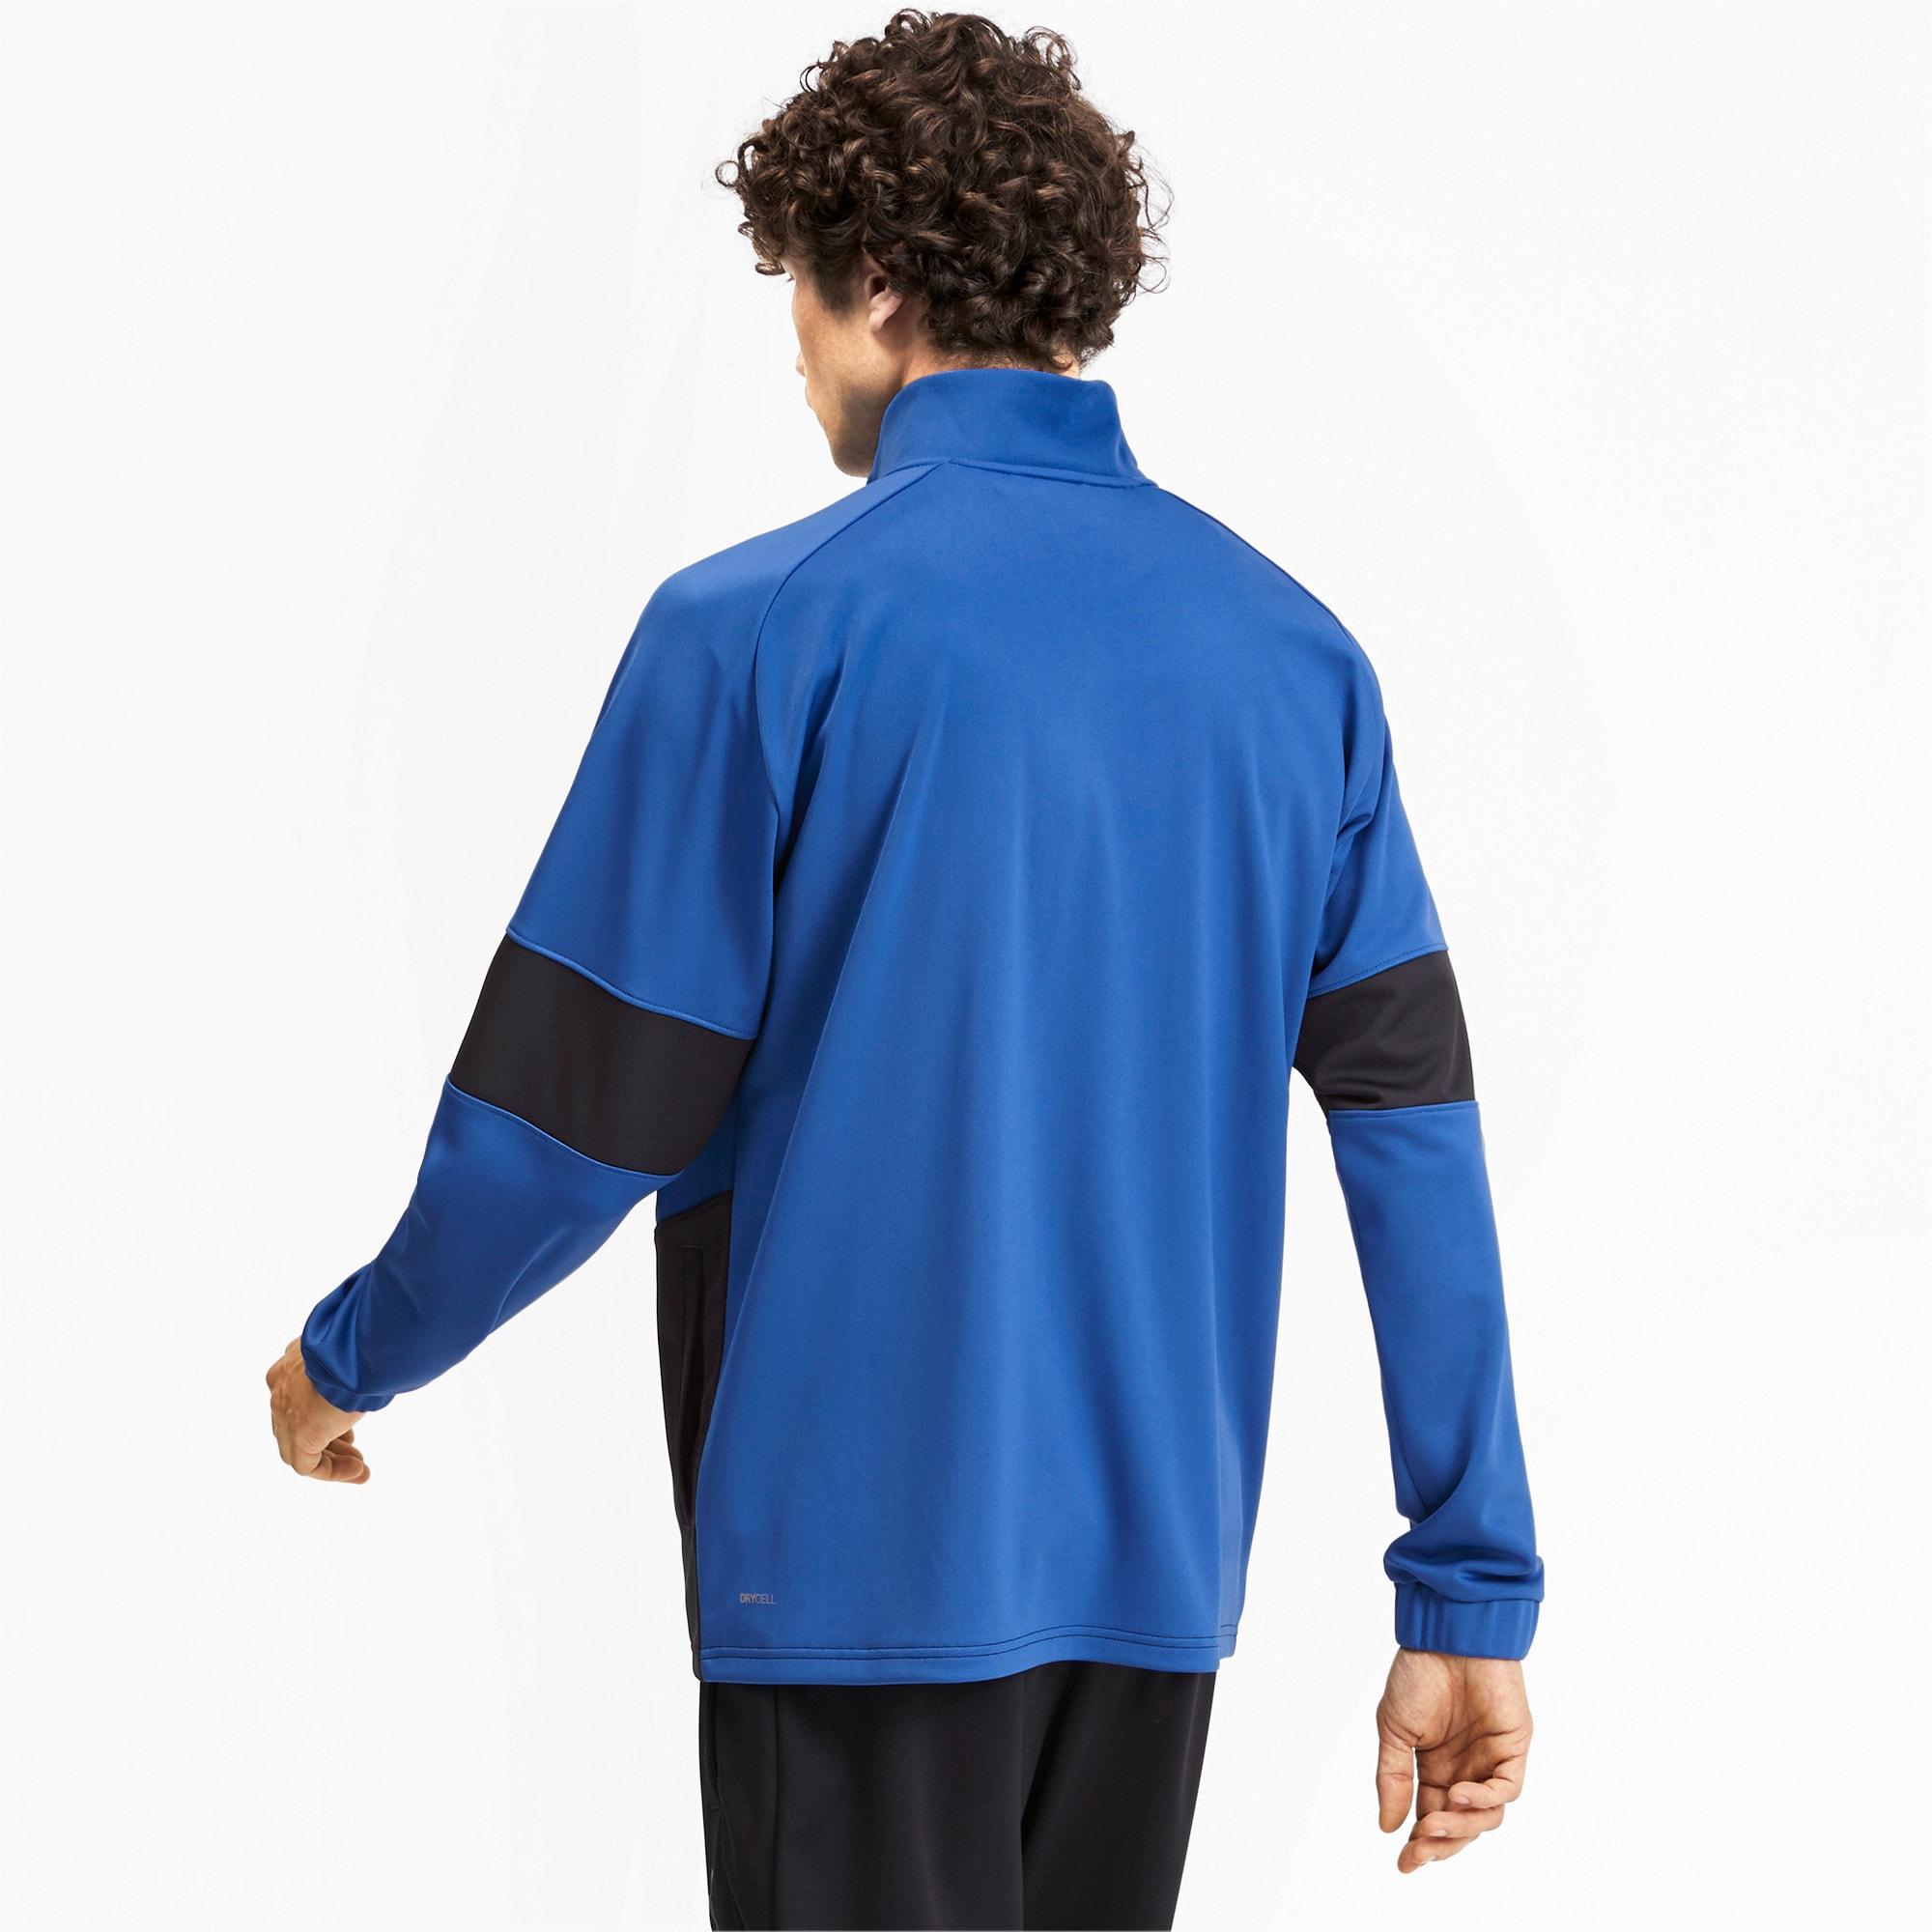 Thumbnail 3 of PUMA Blaster Men's Jacket, Galaxy Blue-Puma Black, medium